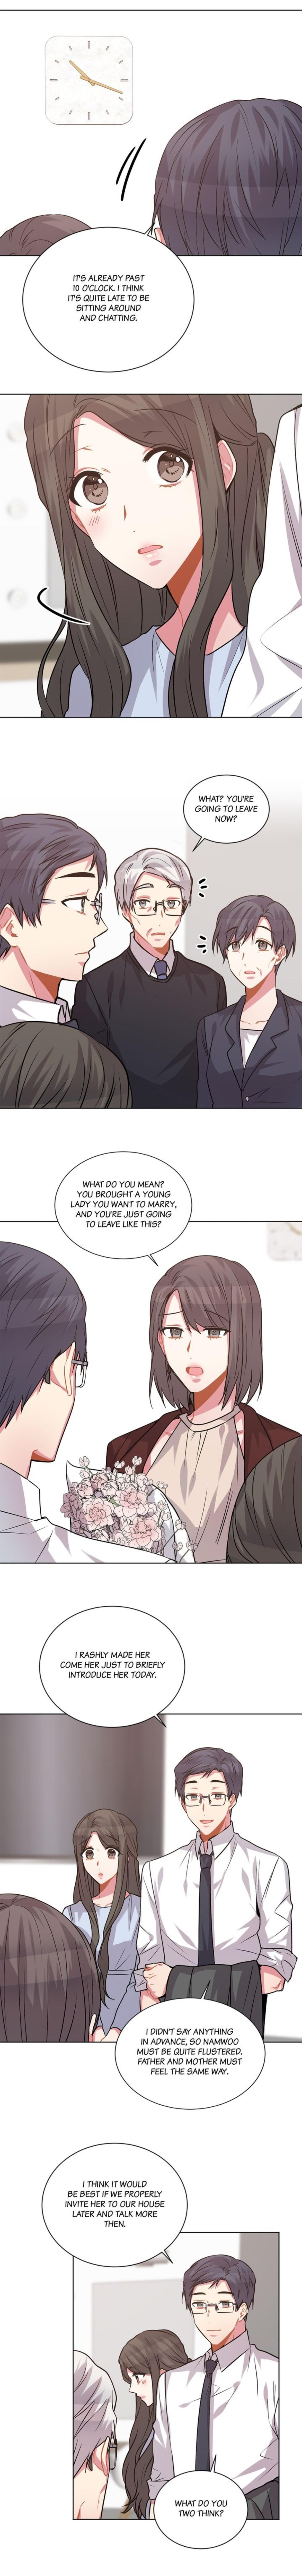 I Found Somebody To Love Chapter 69 page 5 - Mangakakalots.com